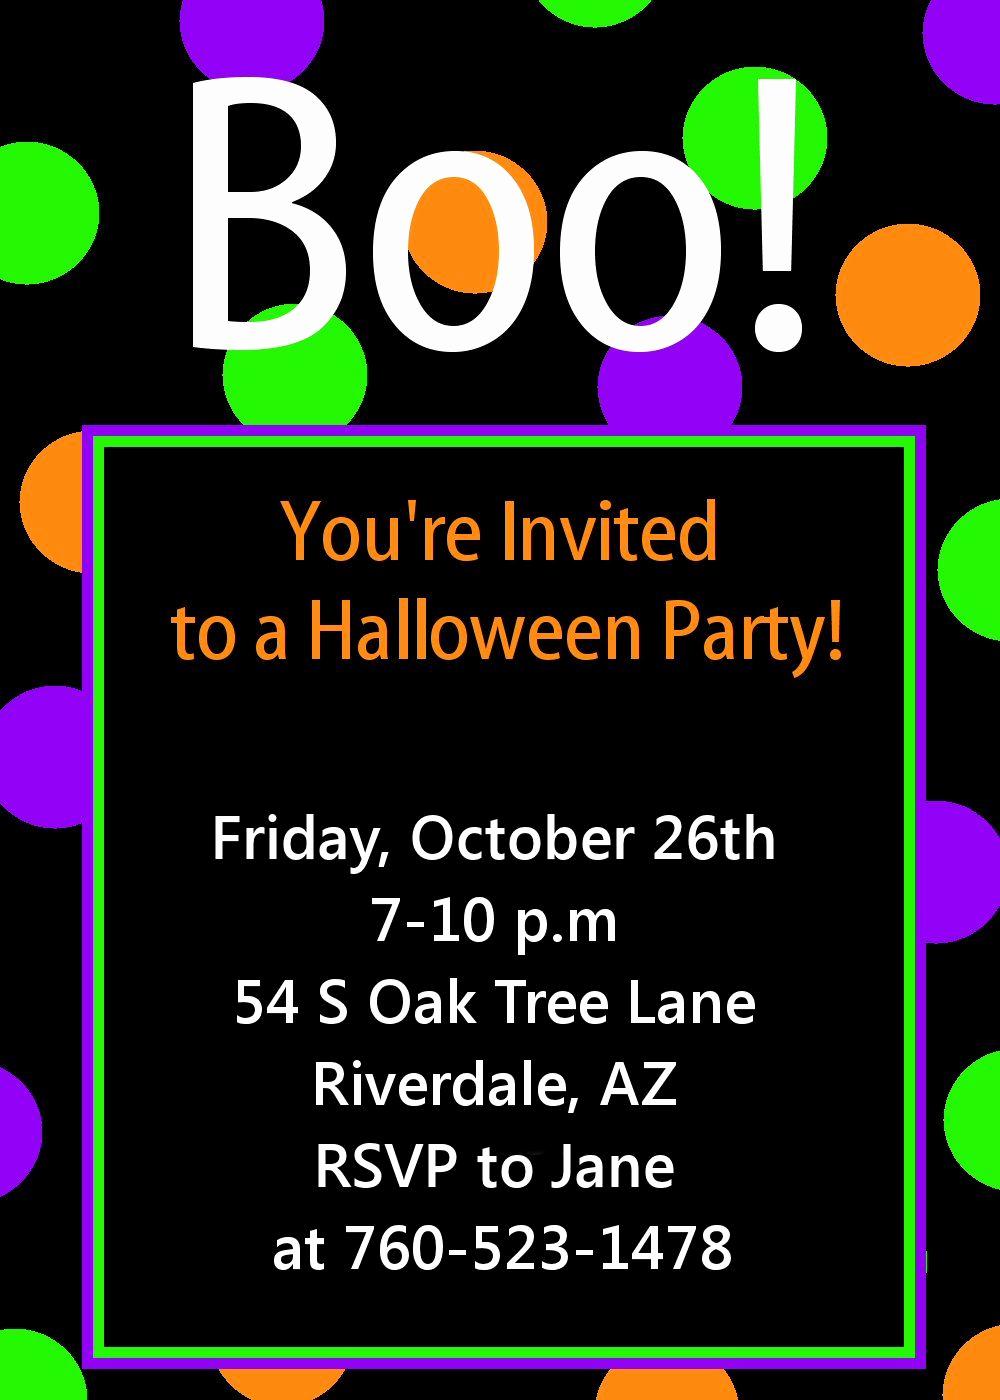 Halloween Party Invitation Template Luxury Free Printable Halloween Party Invitations Templates